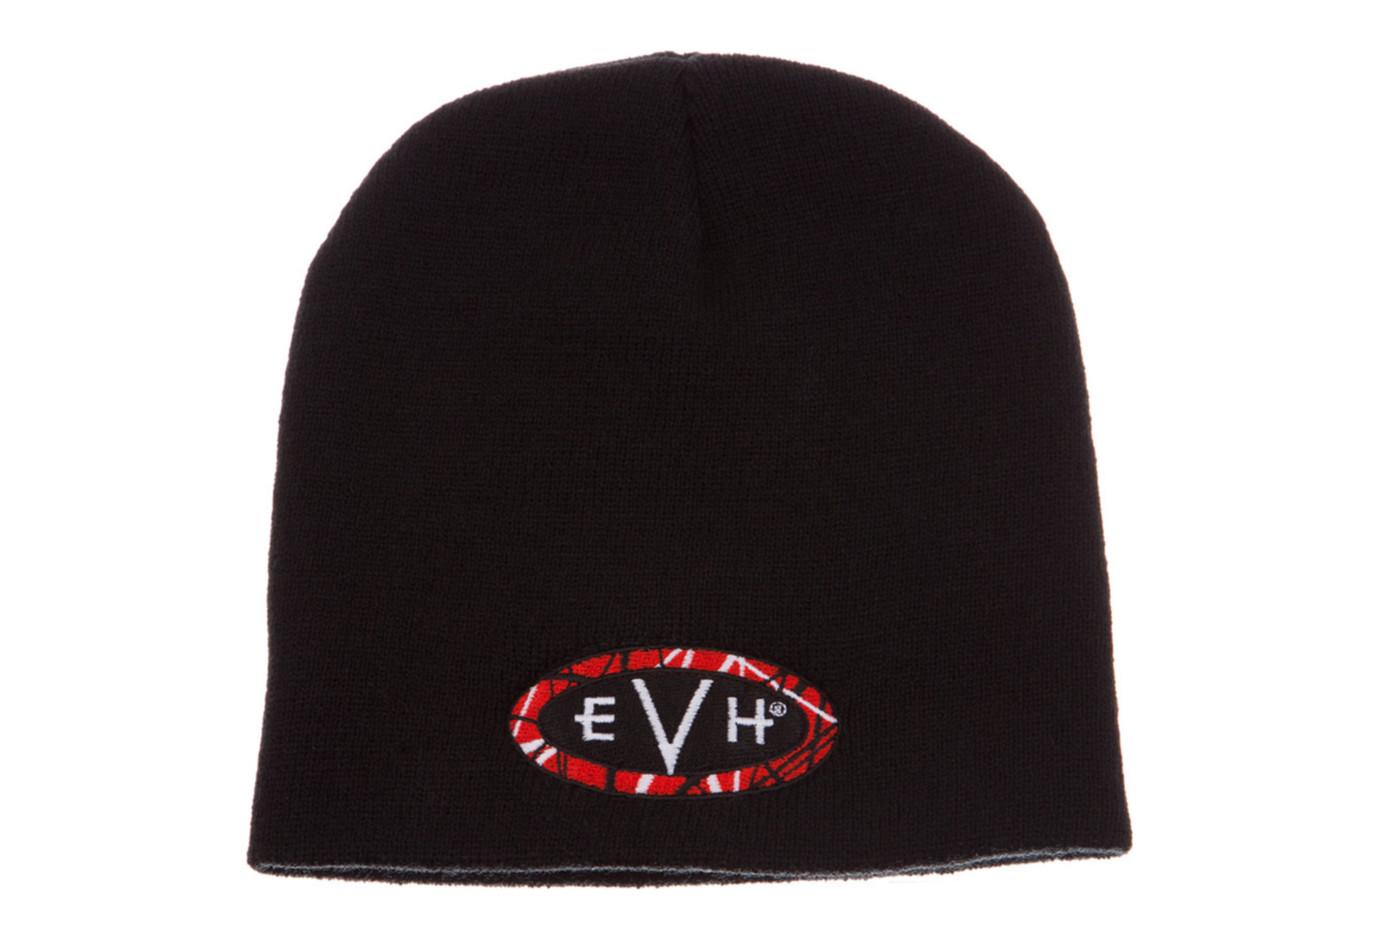 Evh accessories 9123002000 knitted van halen beanie for Yamaha fg830 specs